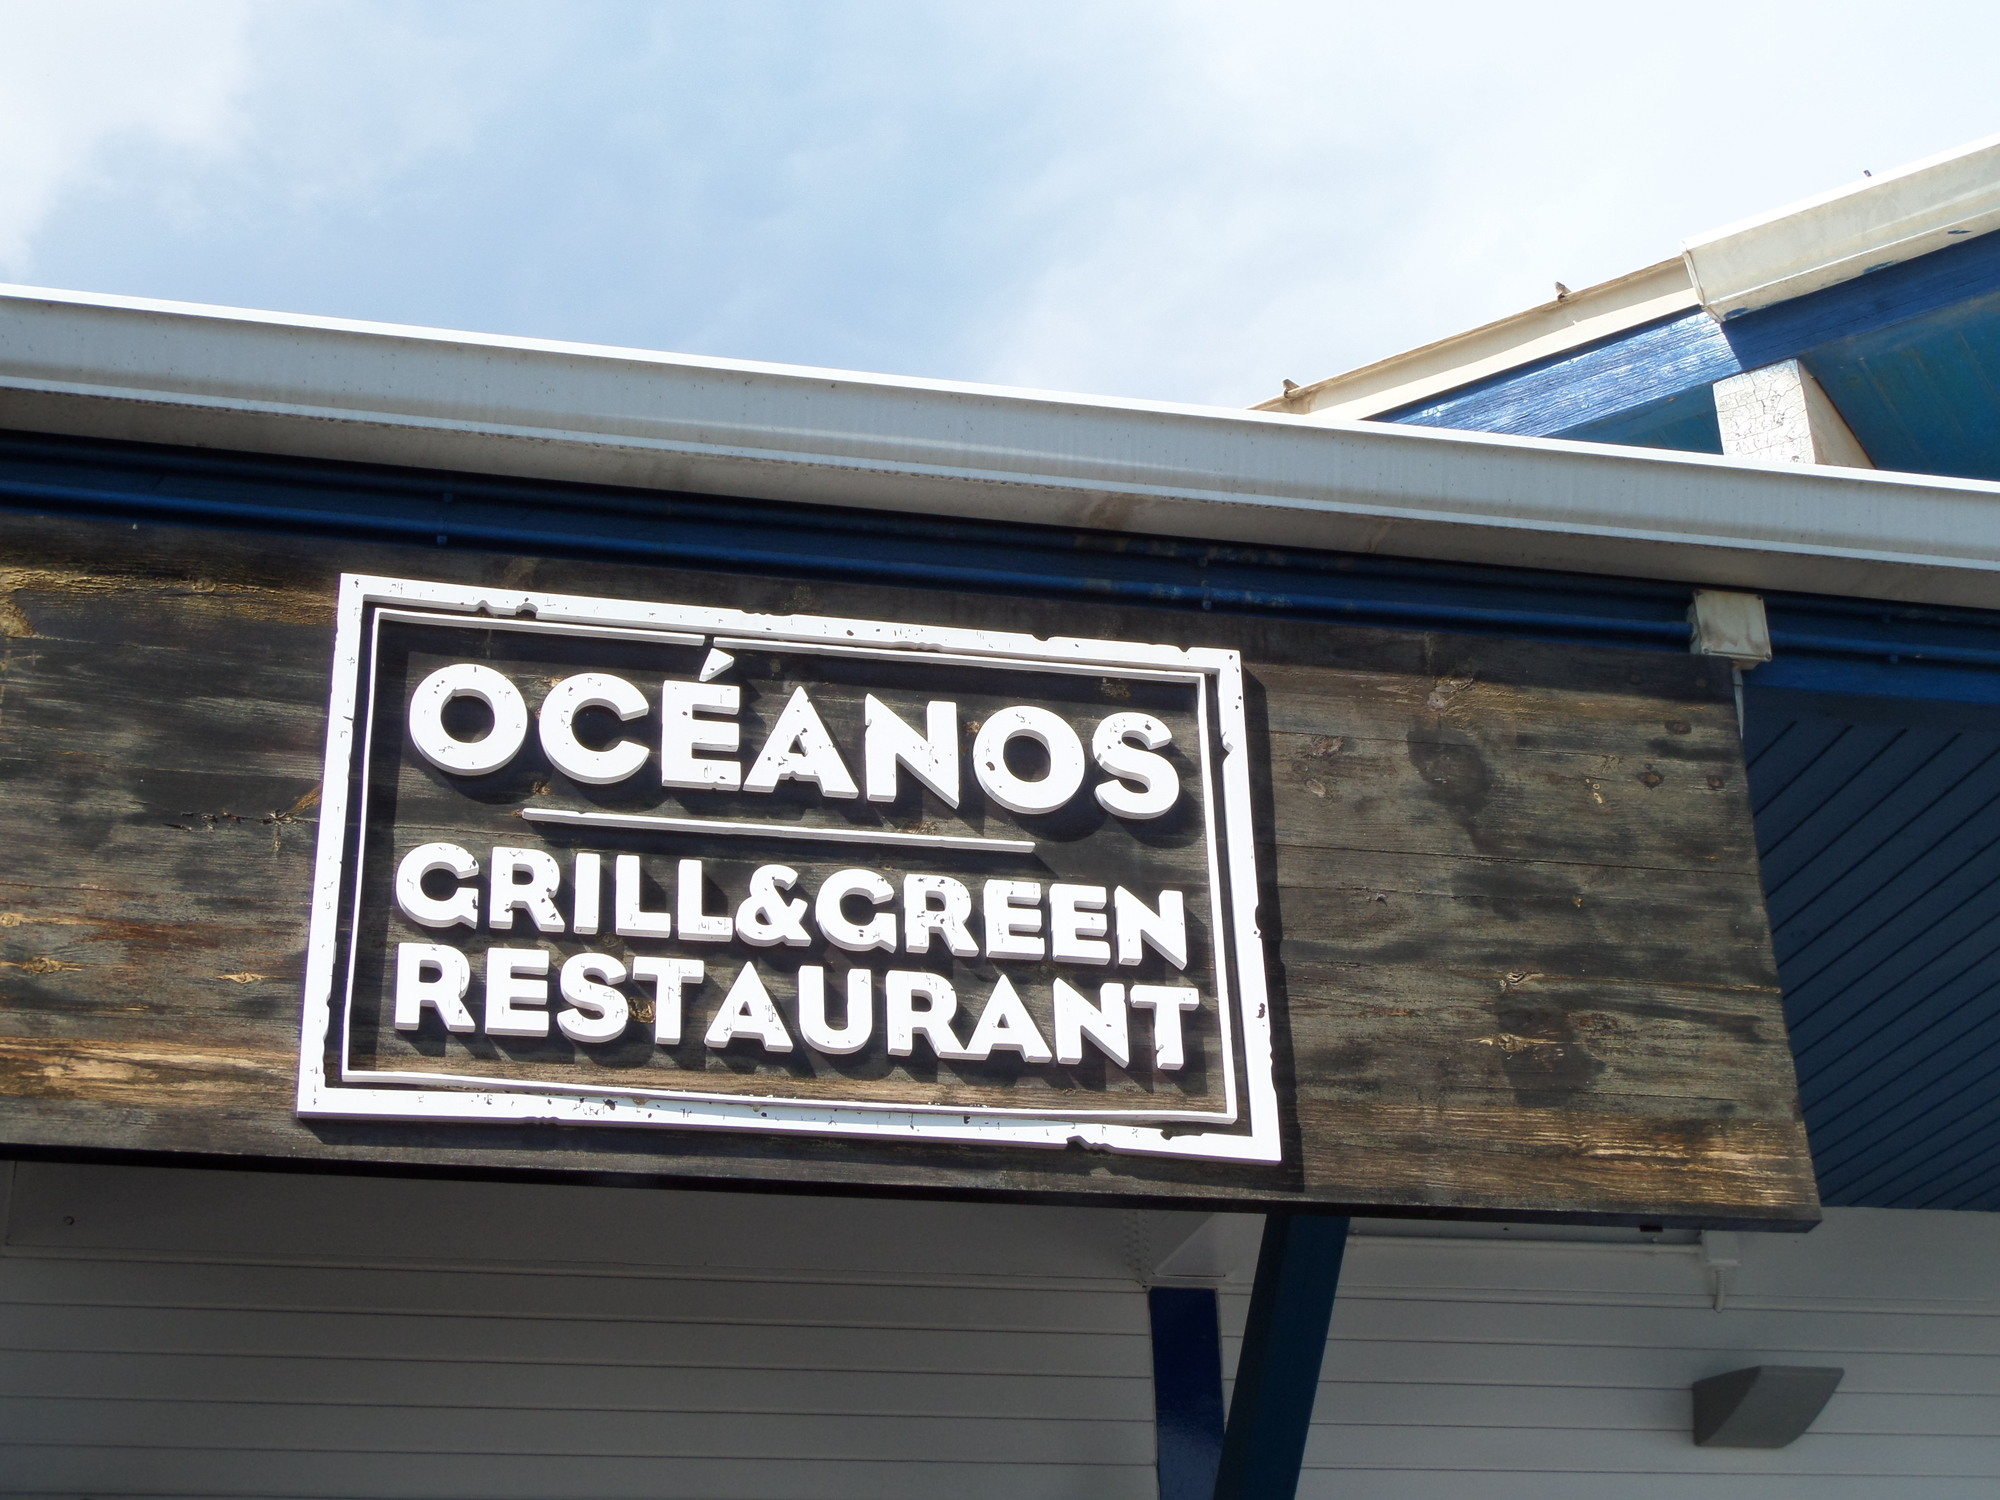 Oceanografic opiniones info precios ofertas pacommunity for Precio entrada aquarium